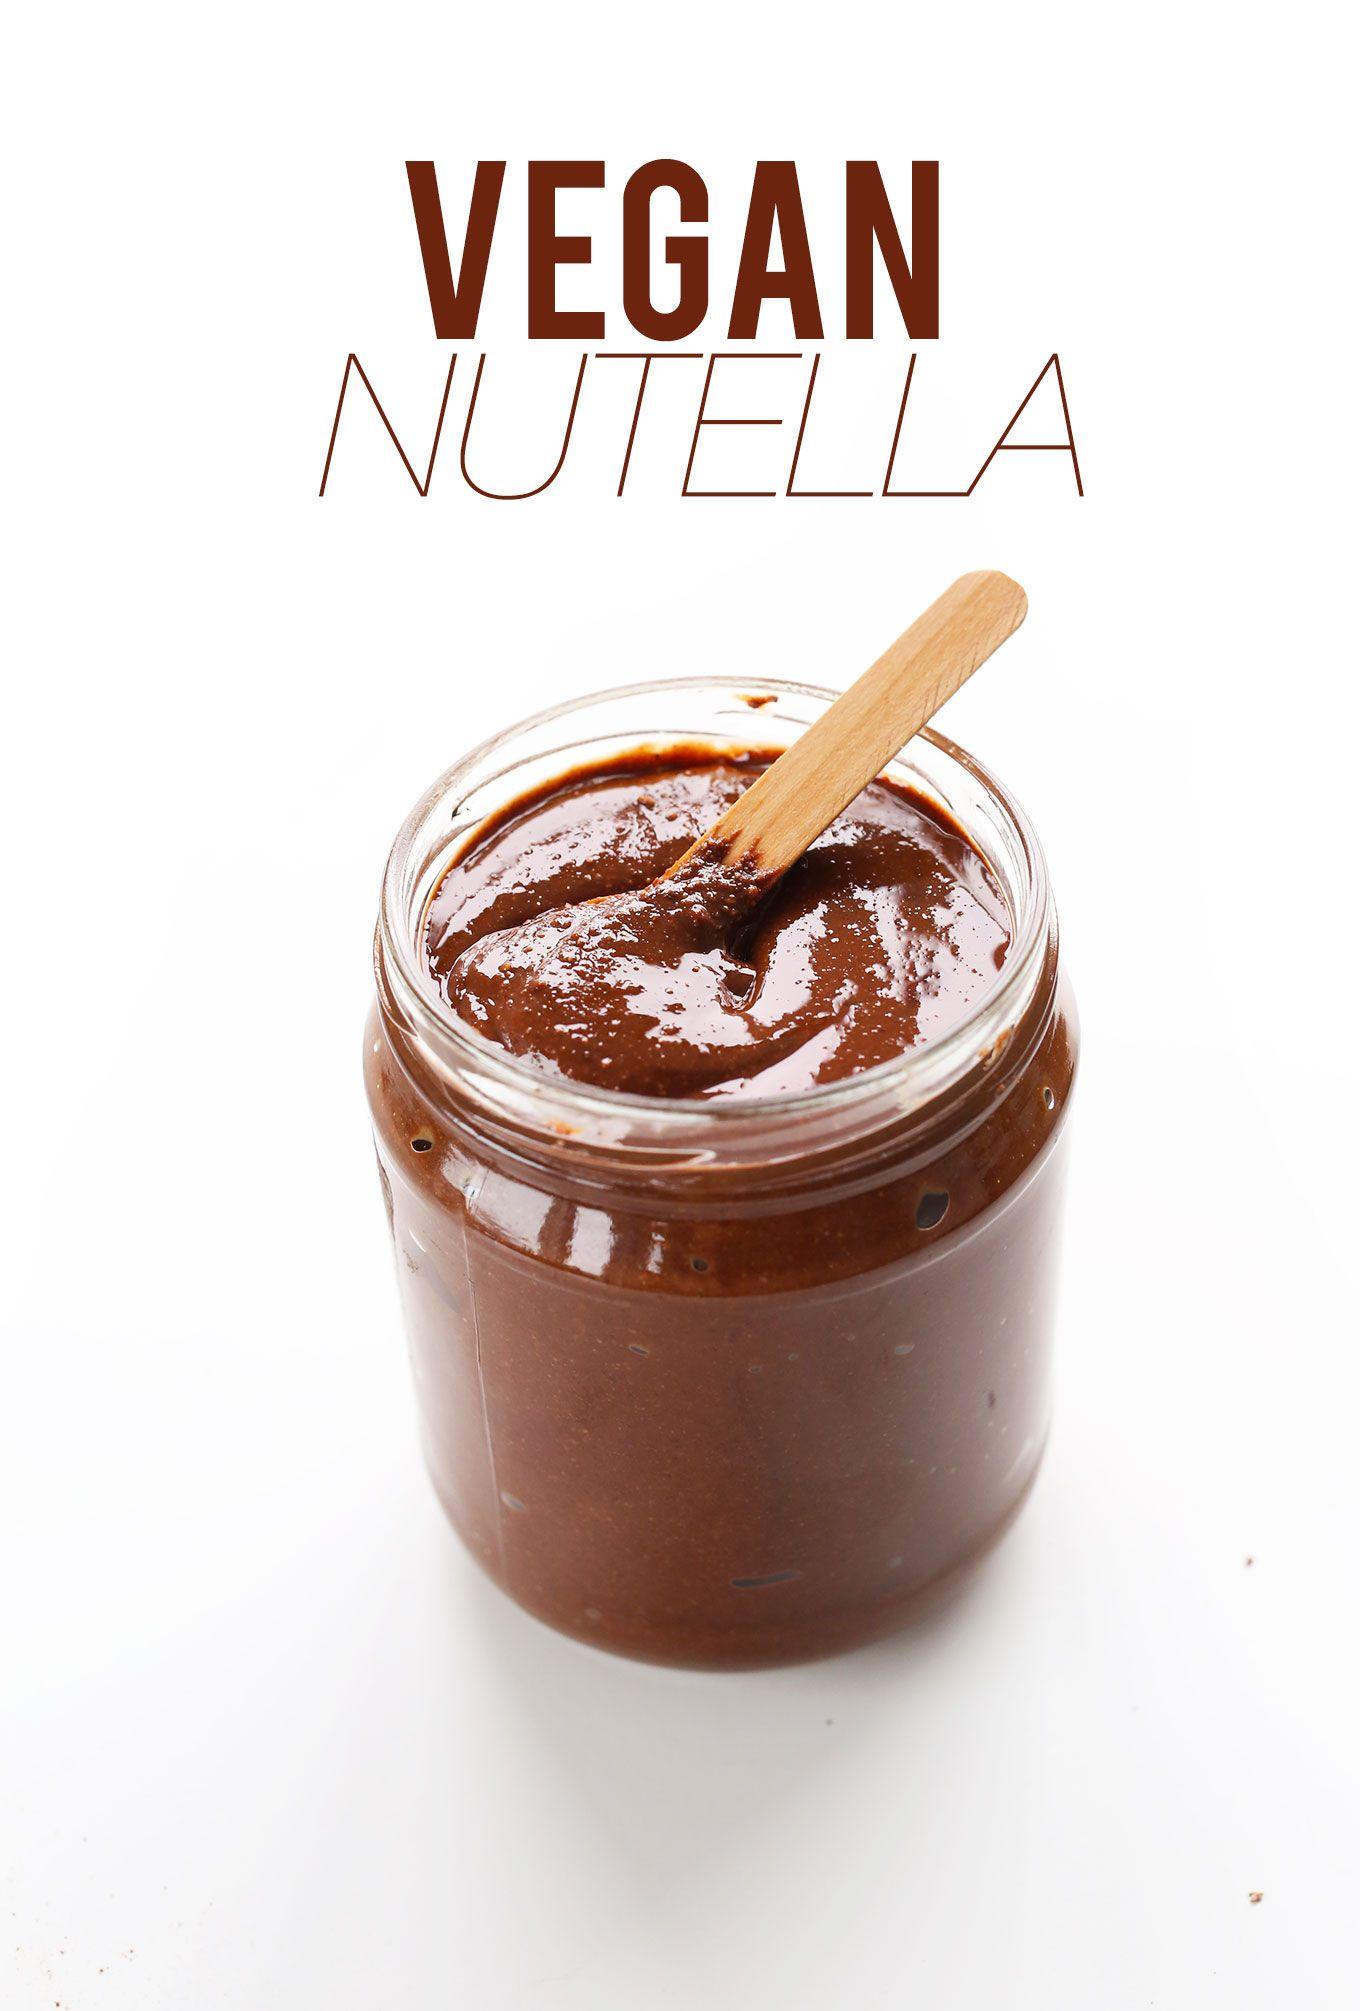 Best 25+ Nutella vegan ideas on Pinterest | Paleo nutella ...